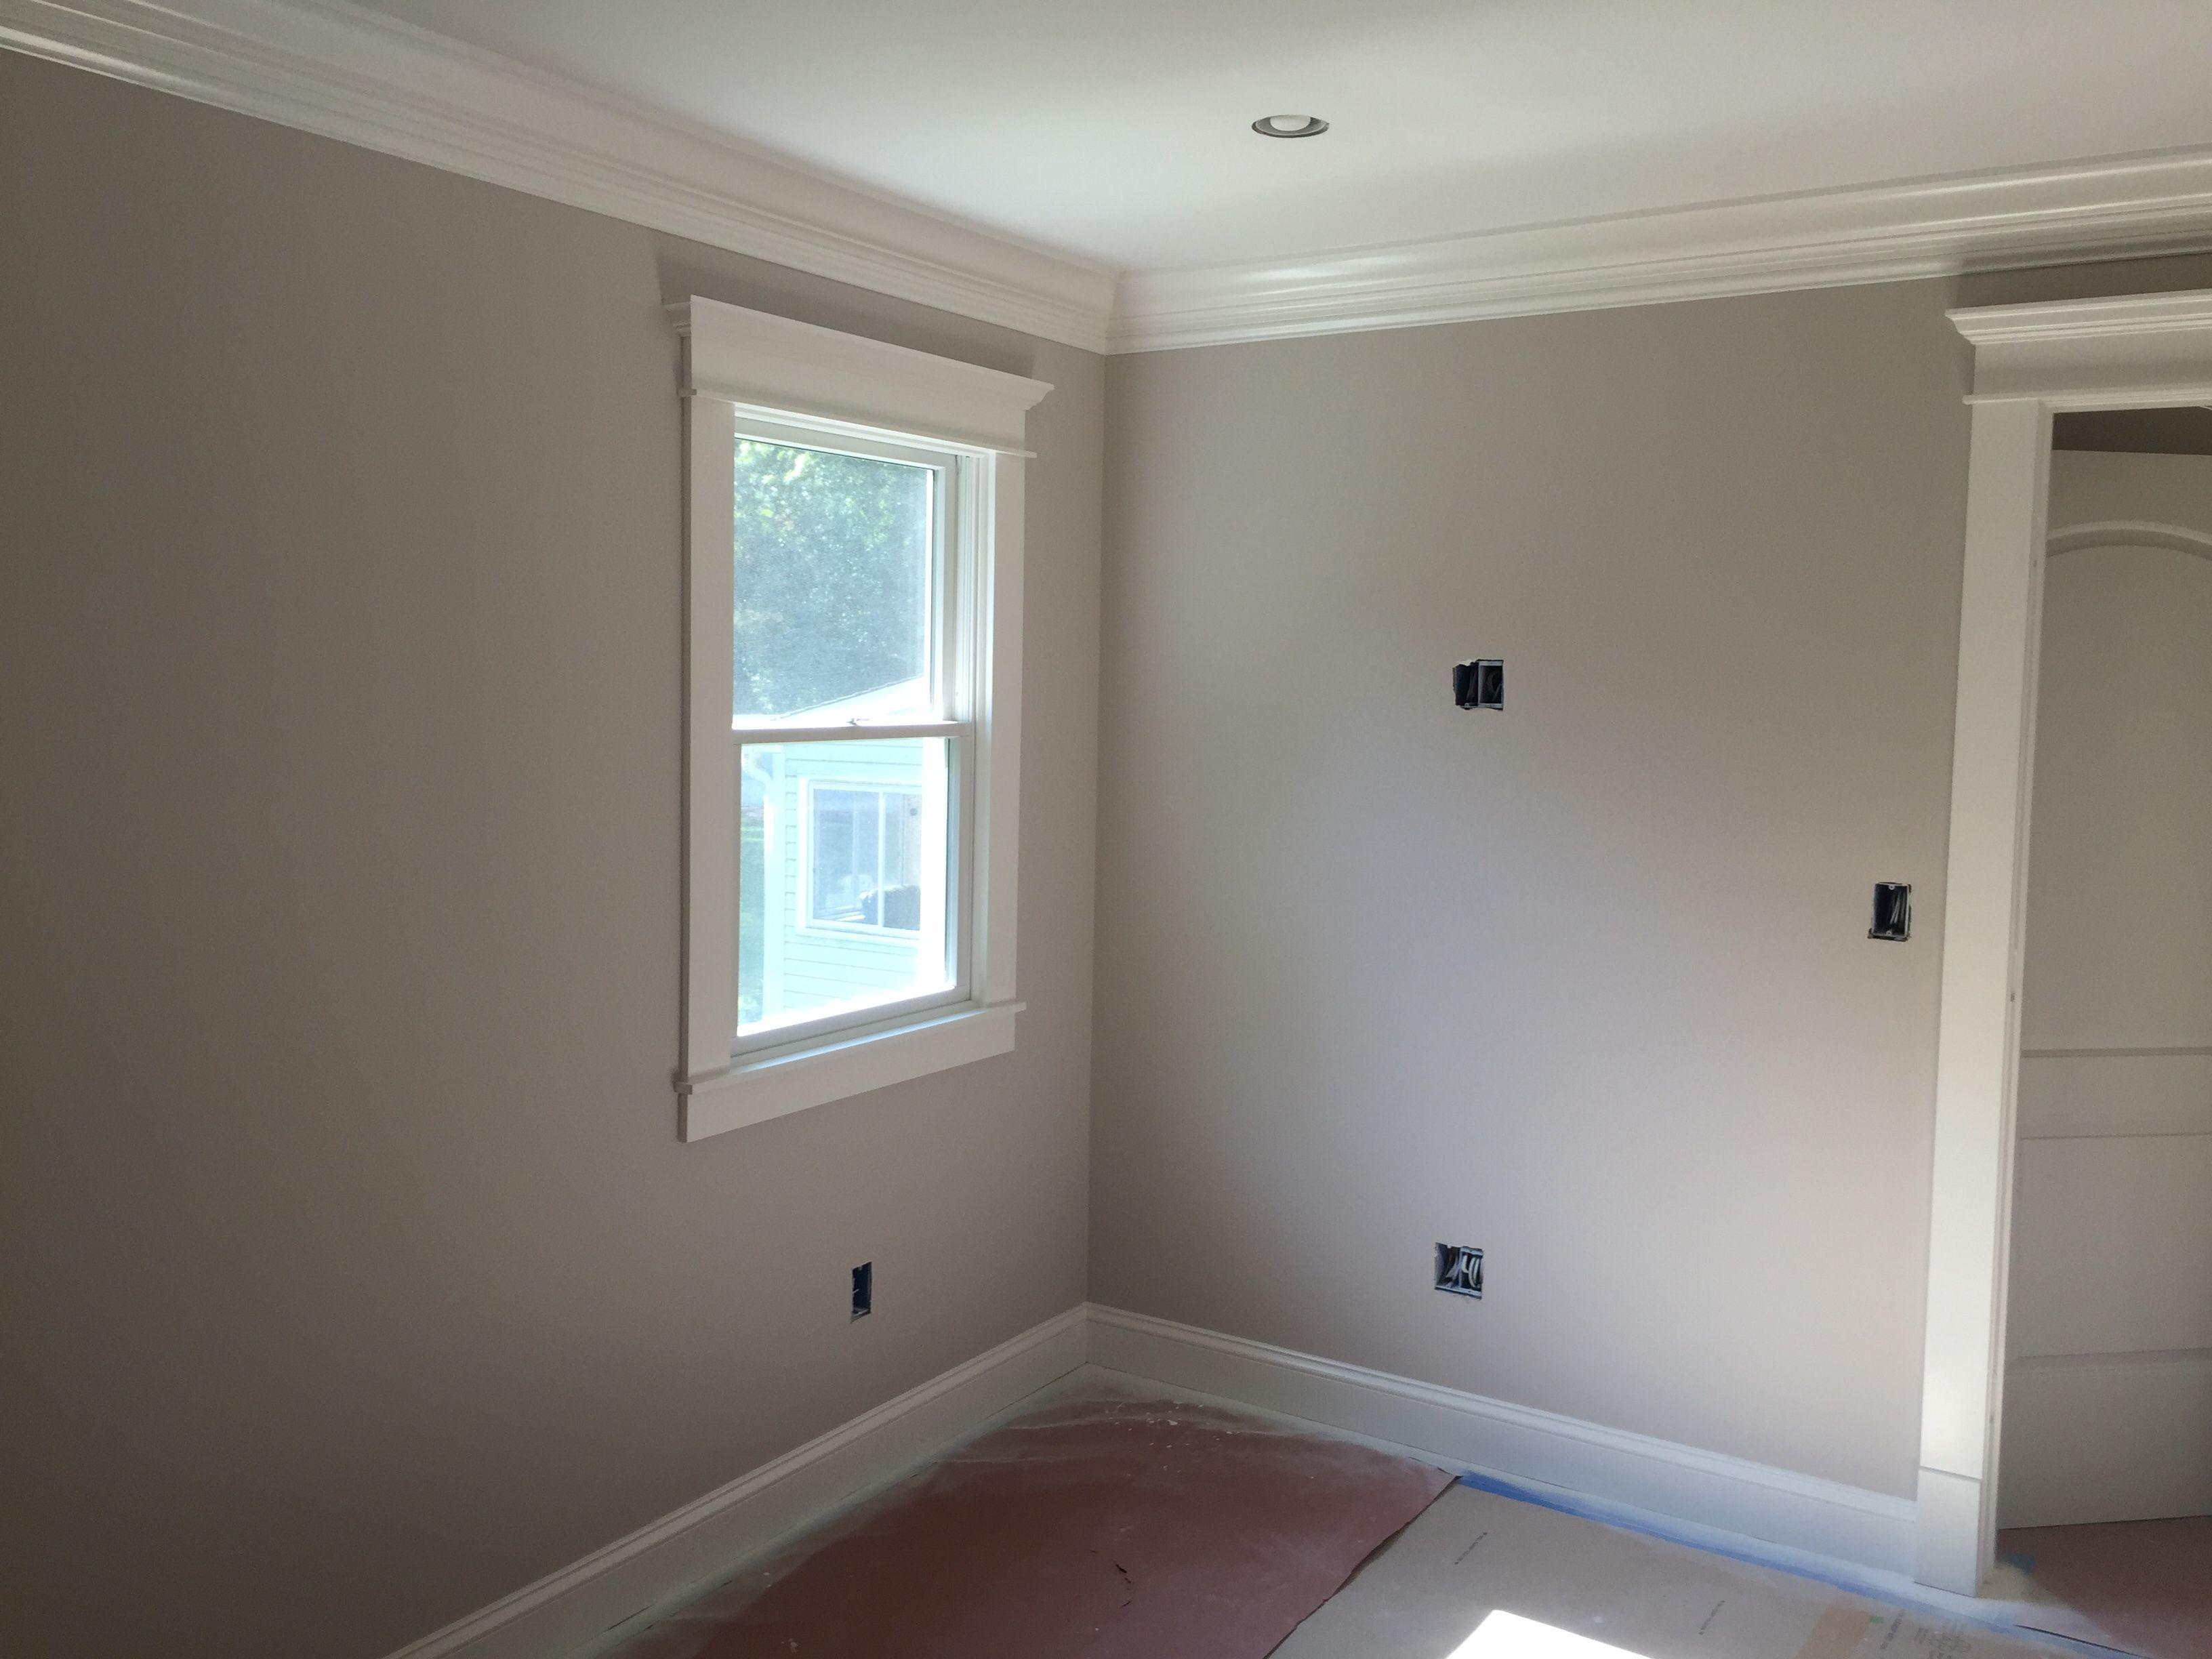 Baby Room Walls Bm Matte Balboa Mist Trim Bm Semi Simply White Painting Trim White Paint My Room Farmhouse Guest Bedroom